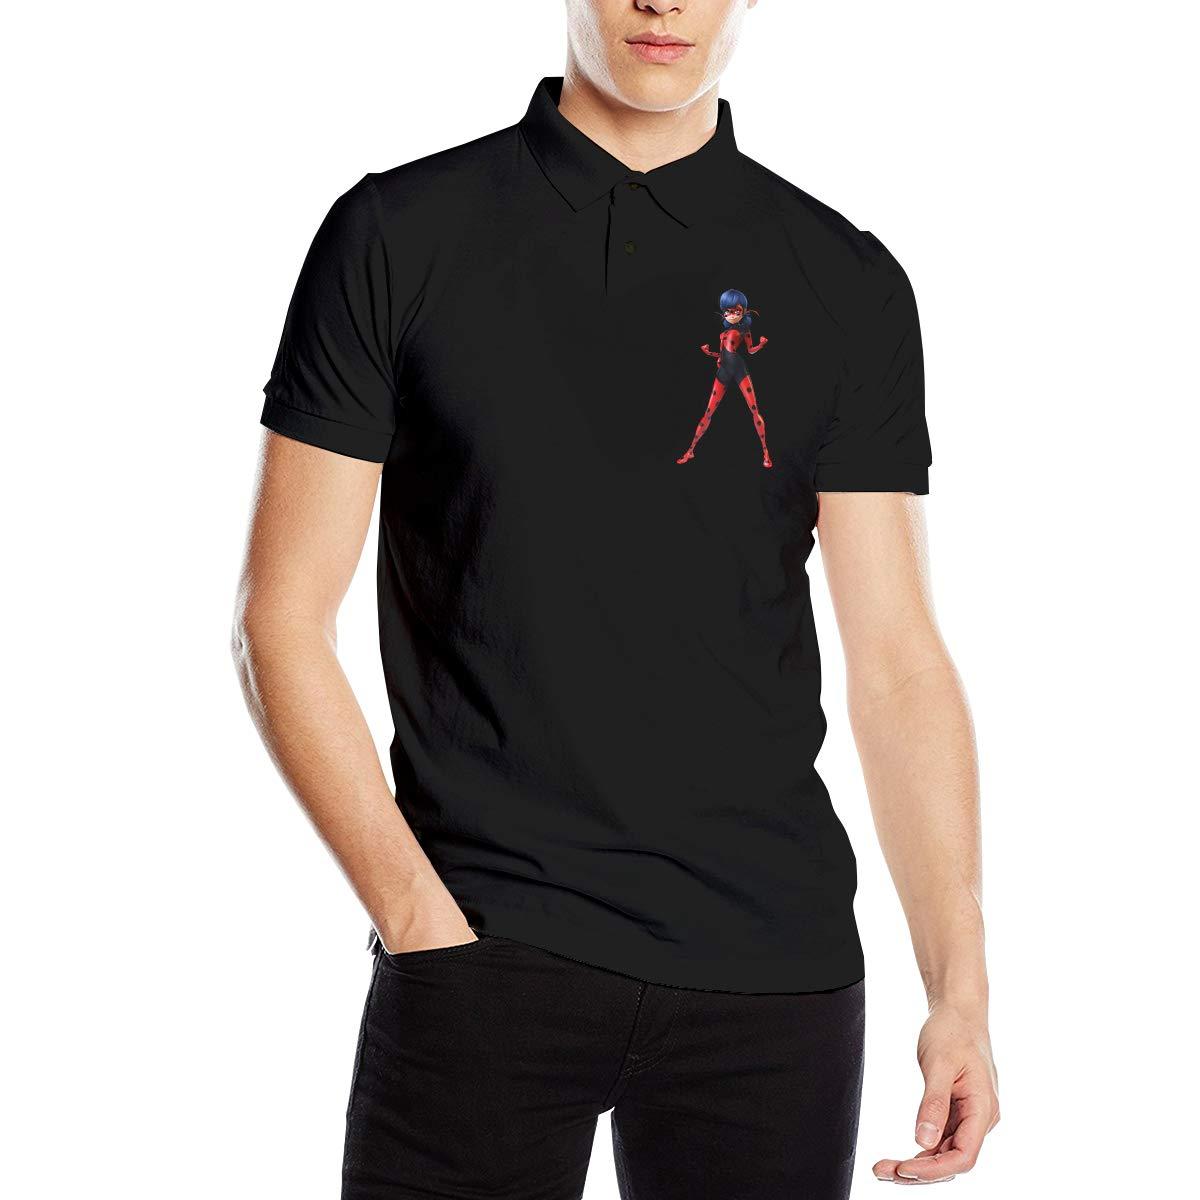 Kinggo Men Design Comfortable Miraculous Ladybug Short Sleeve Classic Polo Shirts Black